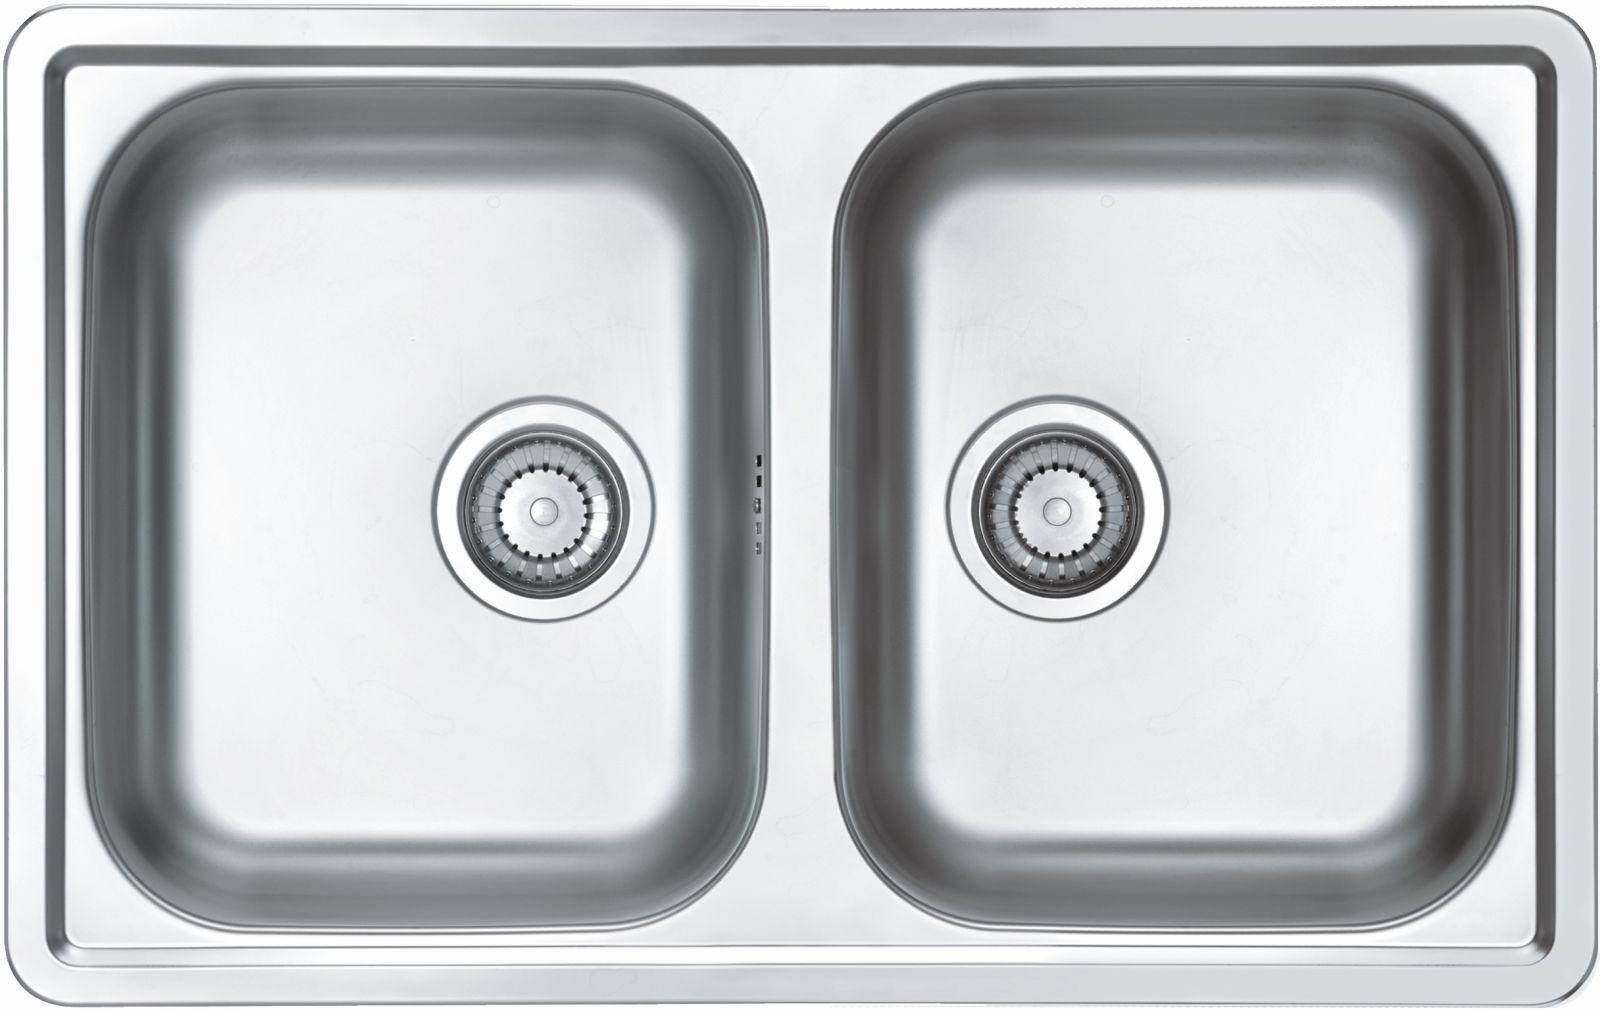 Alveus Küchen Doppelspüle Einbauspüle 790 x 500 mm Camping ...